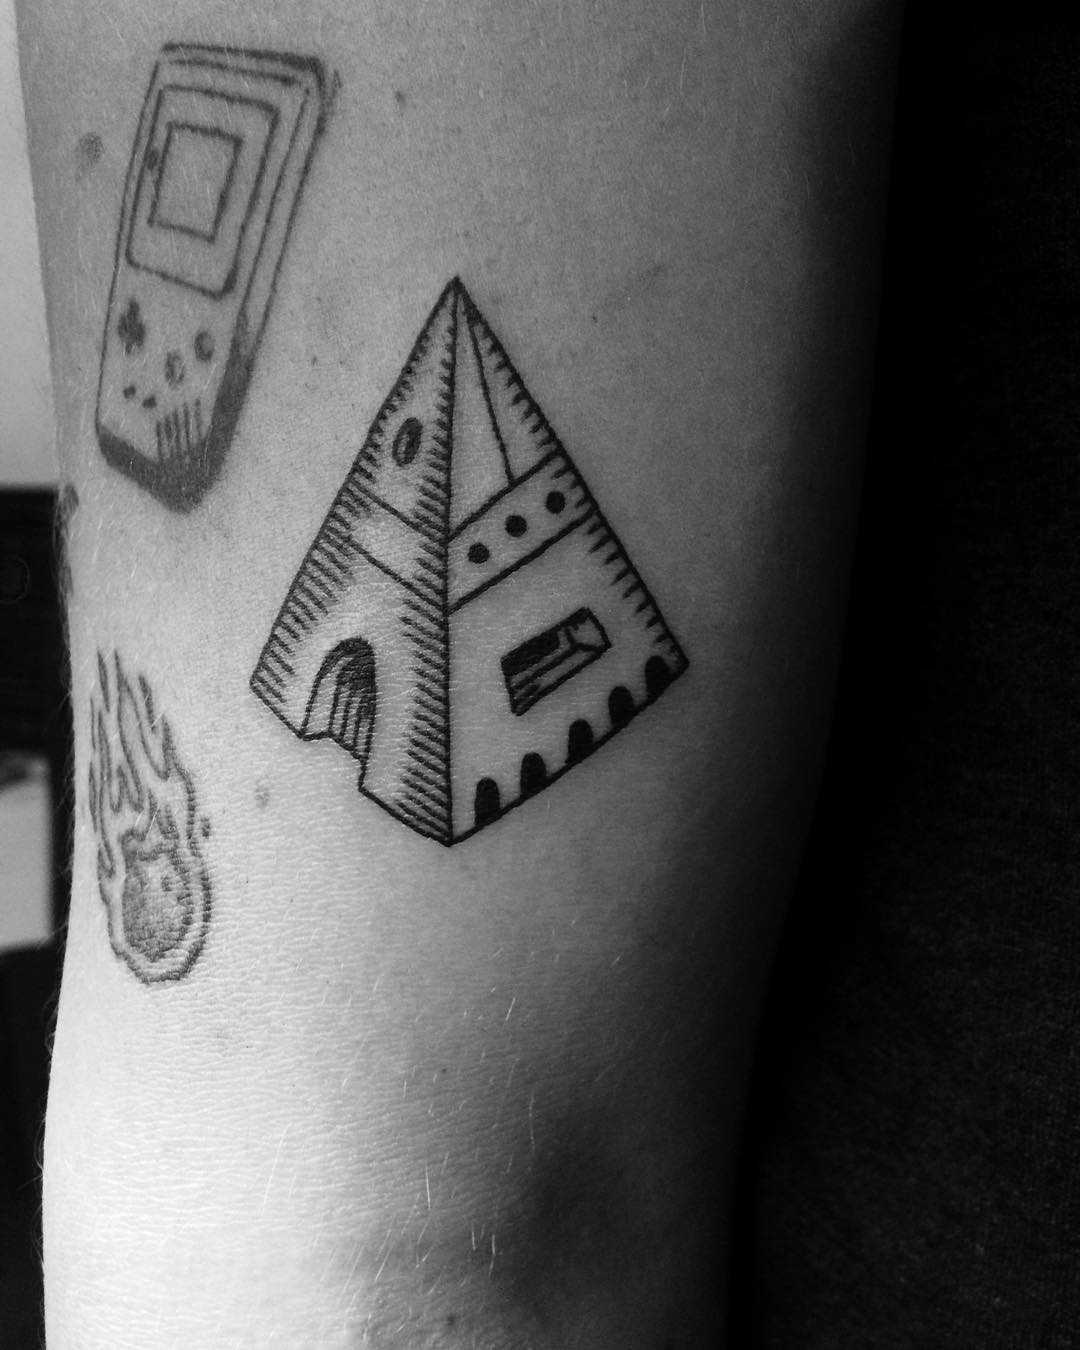 Elevate pyramide tattoo